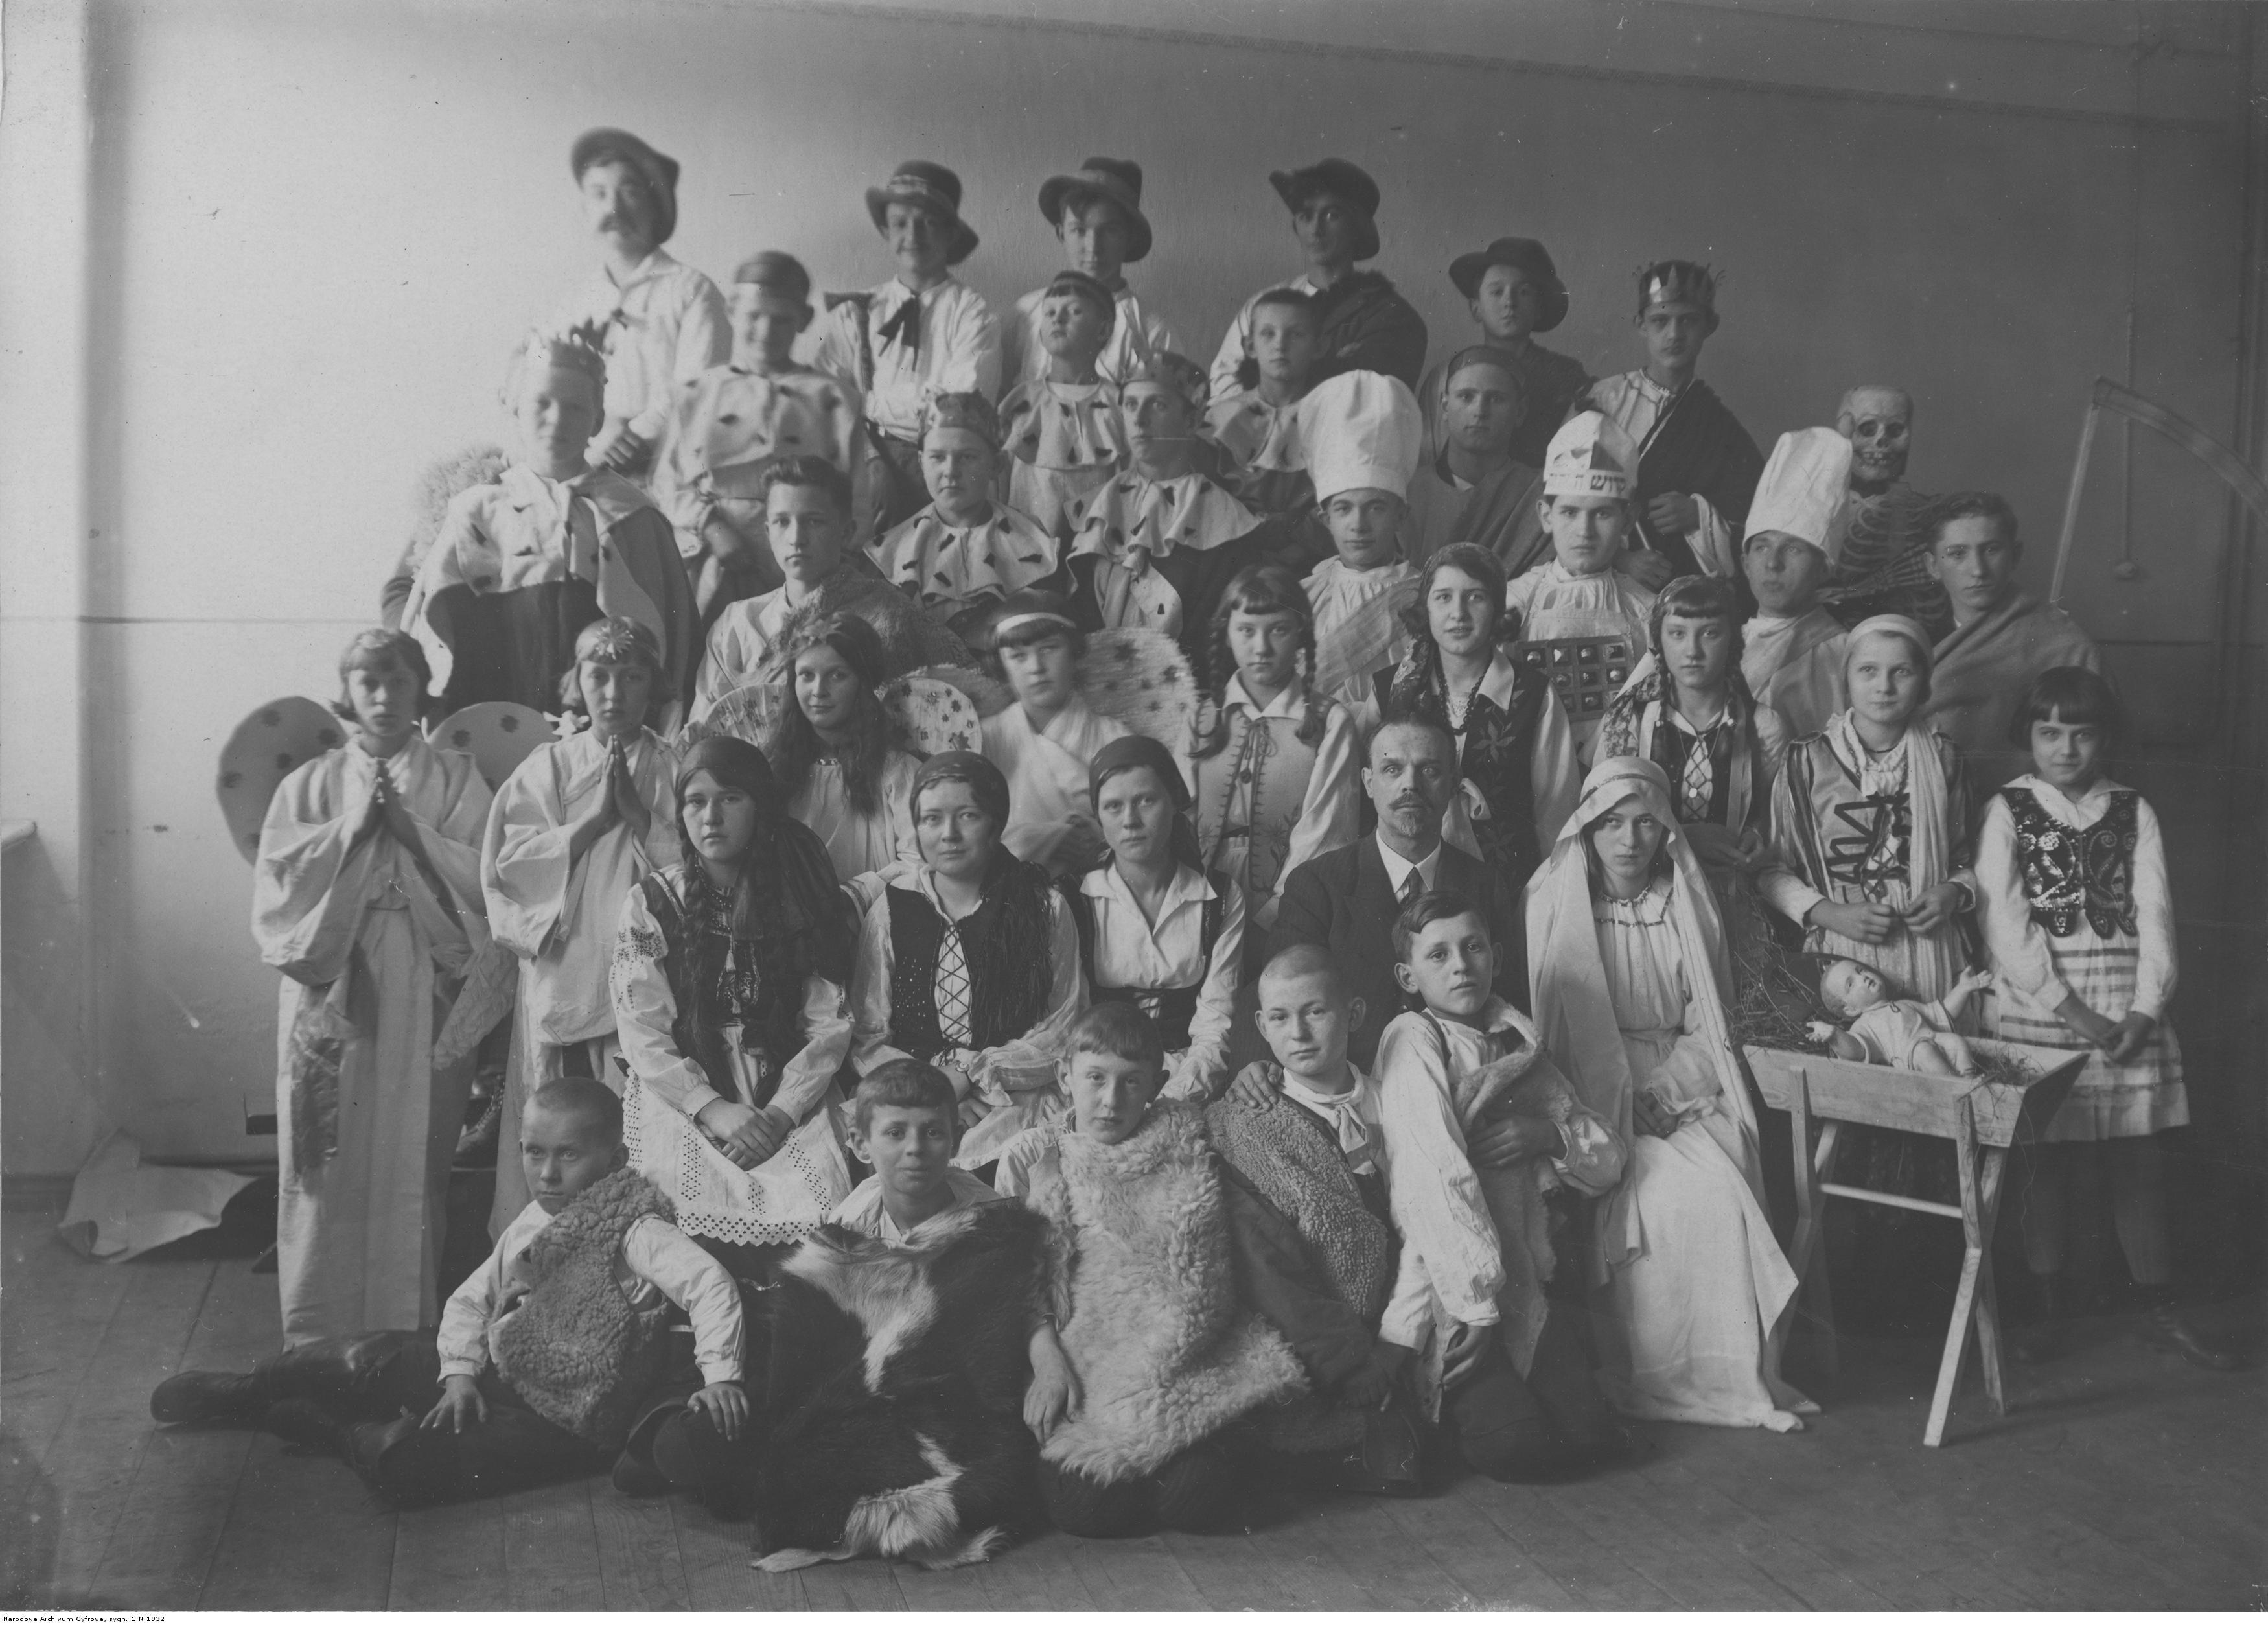 http://img.audiovis.nac.gov.pl/PIC/PIC_1-N-1932.jpg